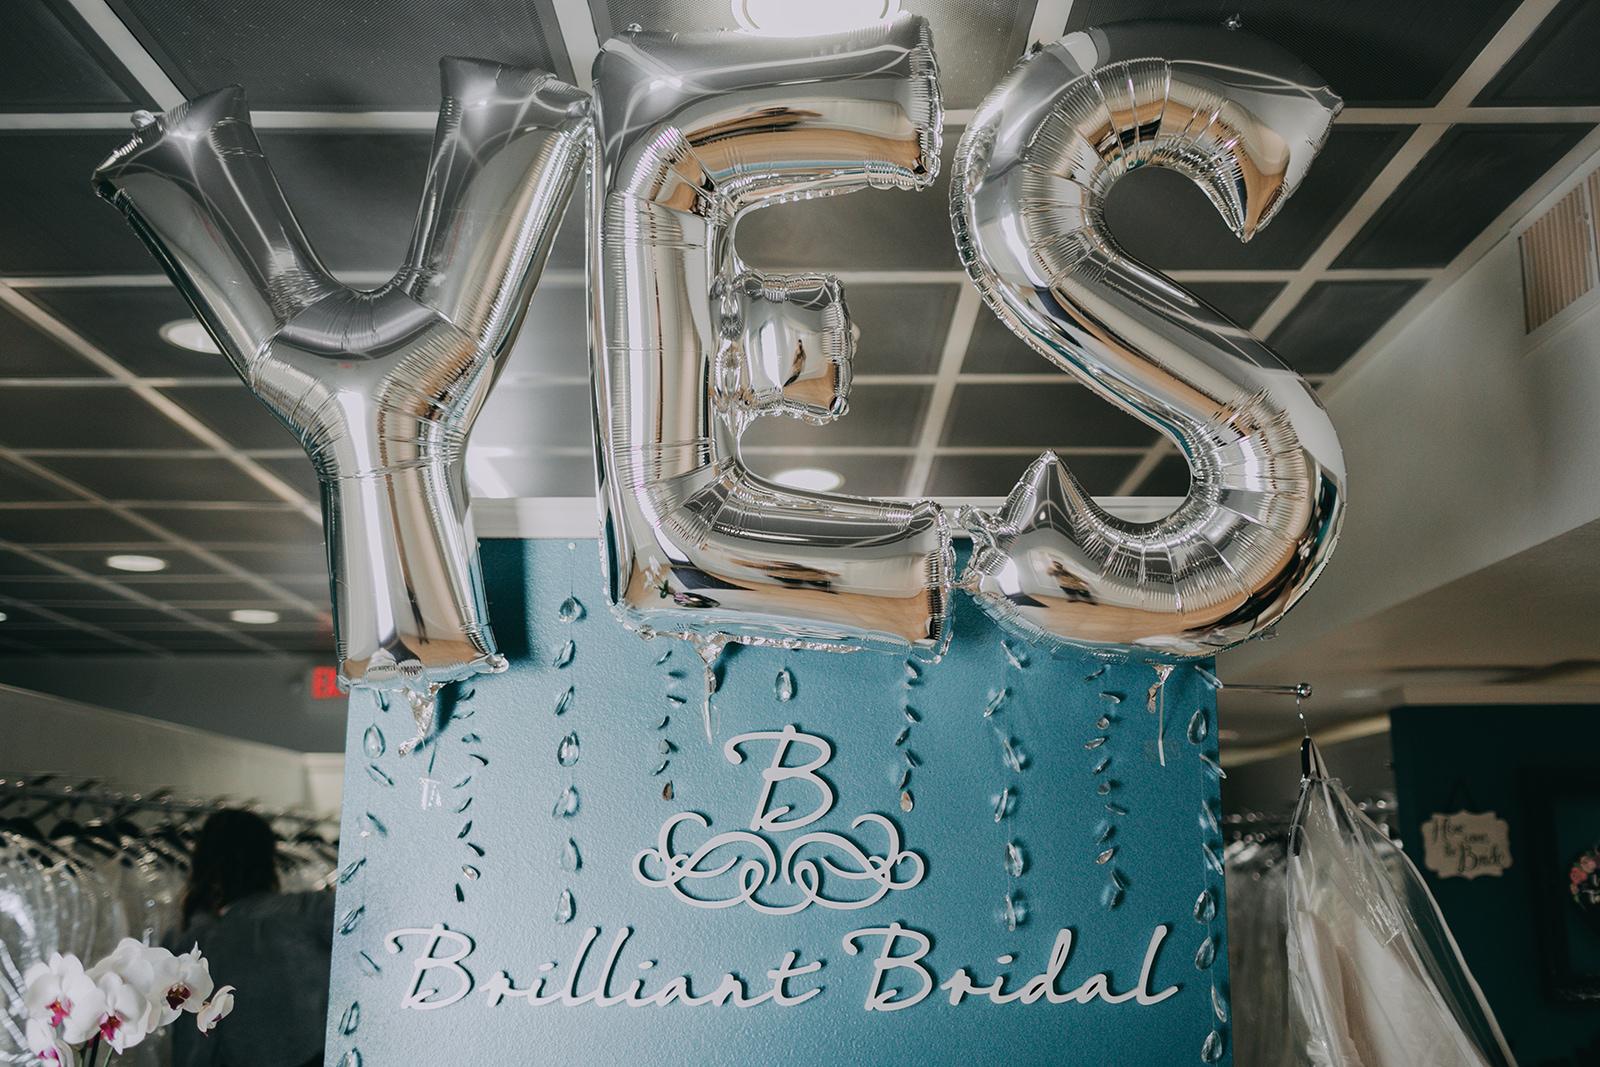 2018 0708 Brilliant Bridal 0012.jpg